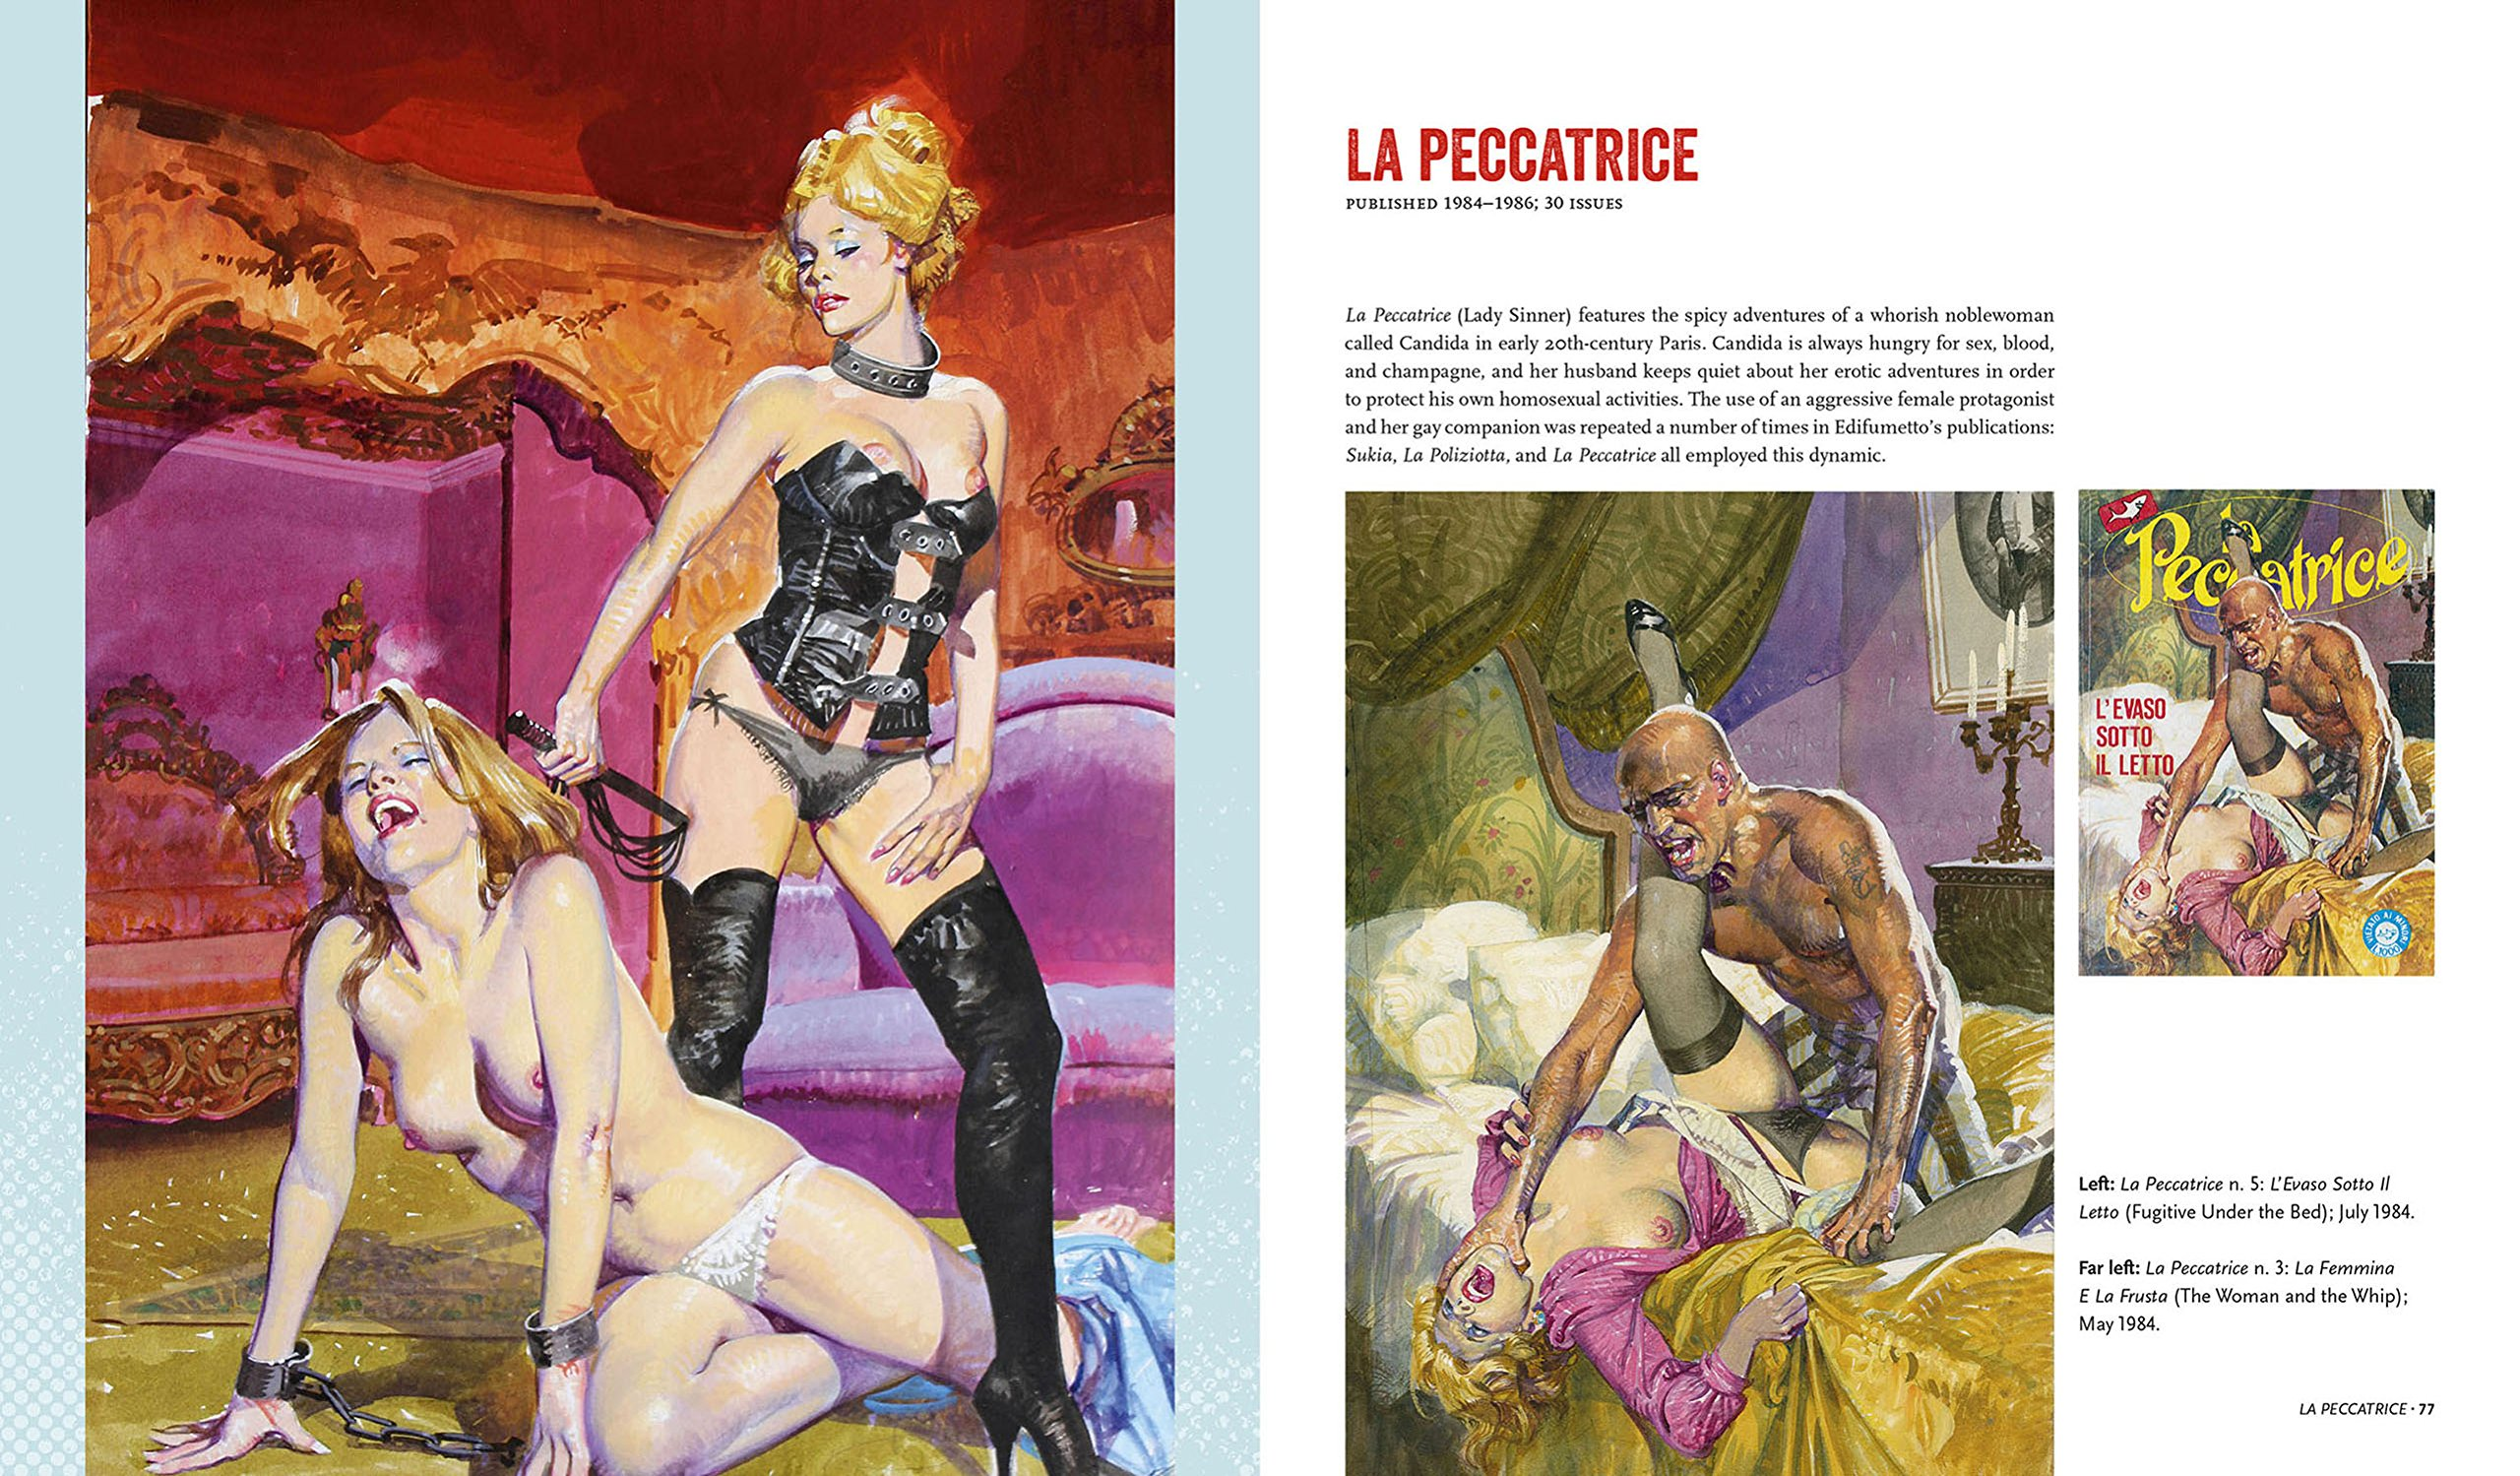 Comic-Betrug sexy Bilder